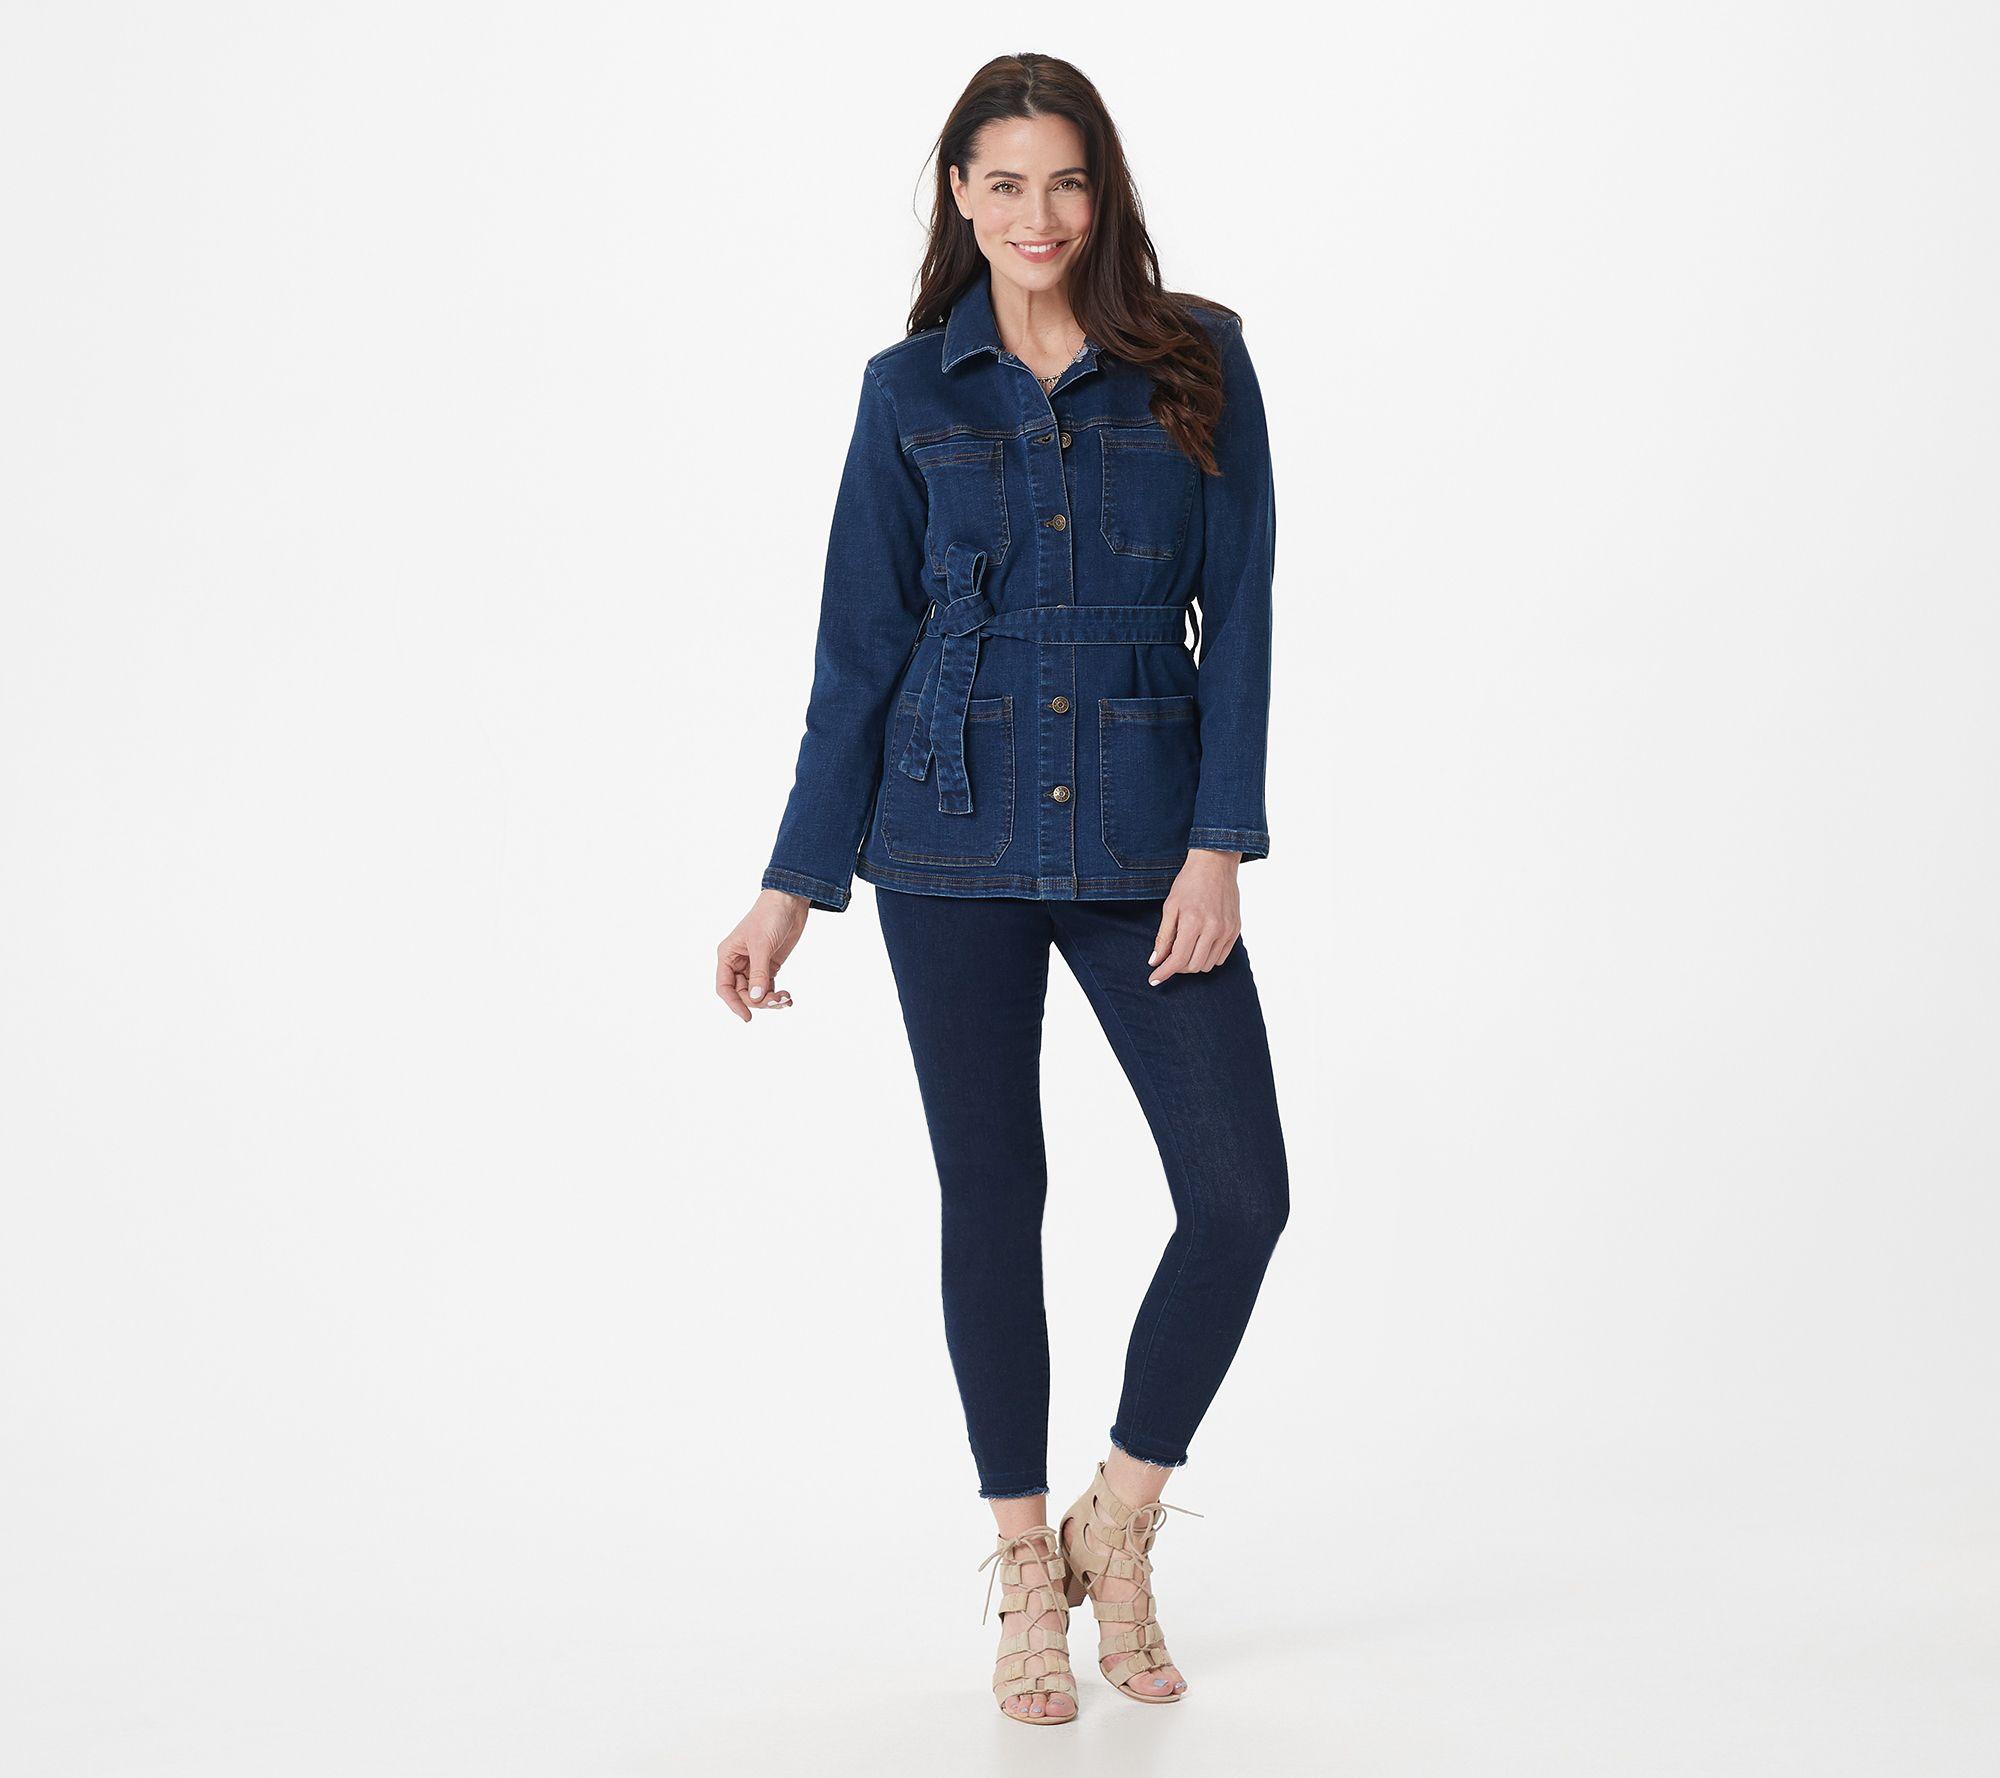 Quacker Factory DreamJeannes Tall Knit Denim Soft Coral 22 NEW A217496